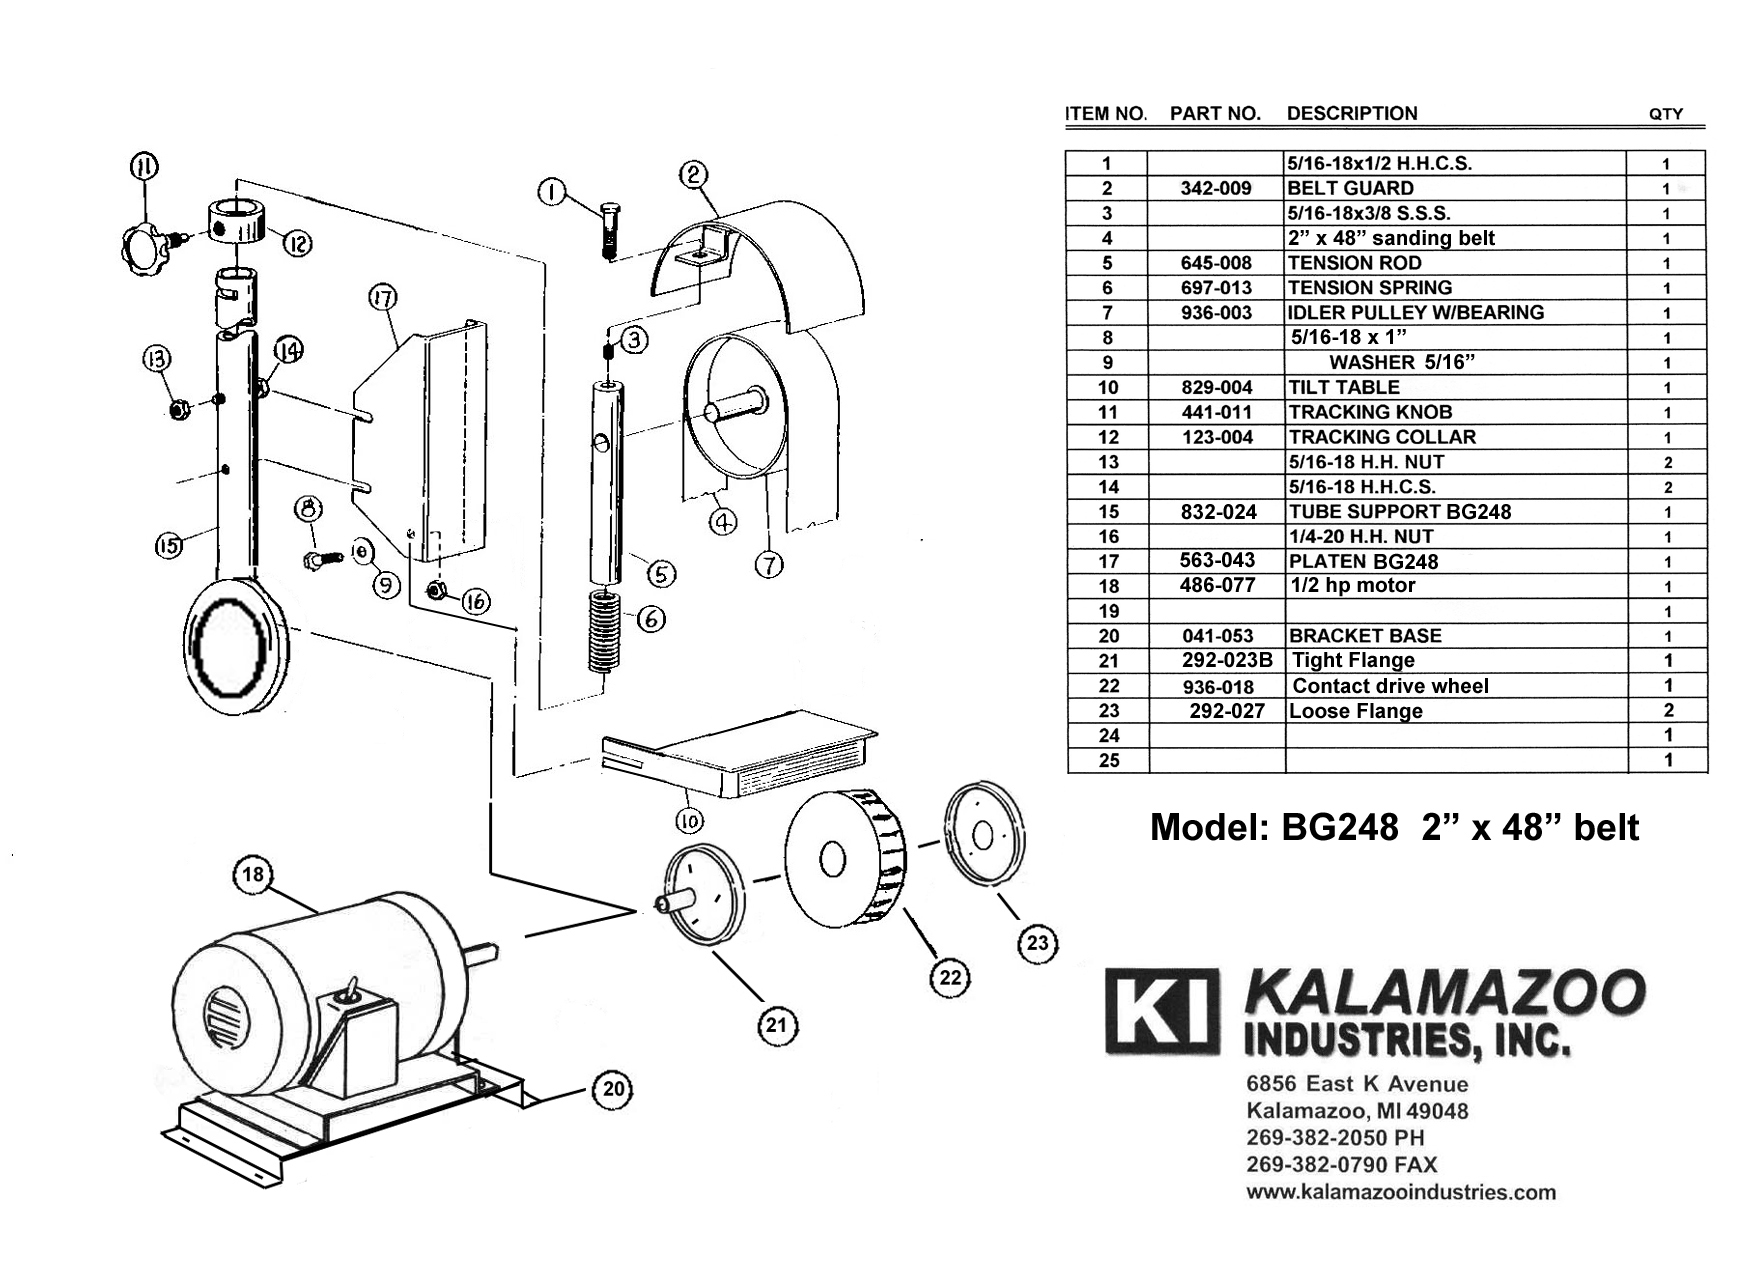 BG248 replacement parts list